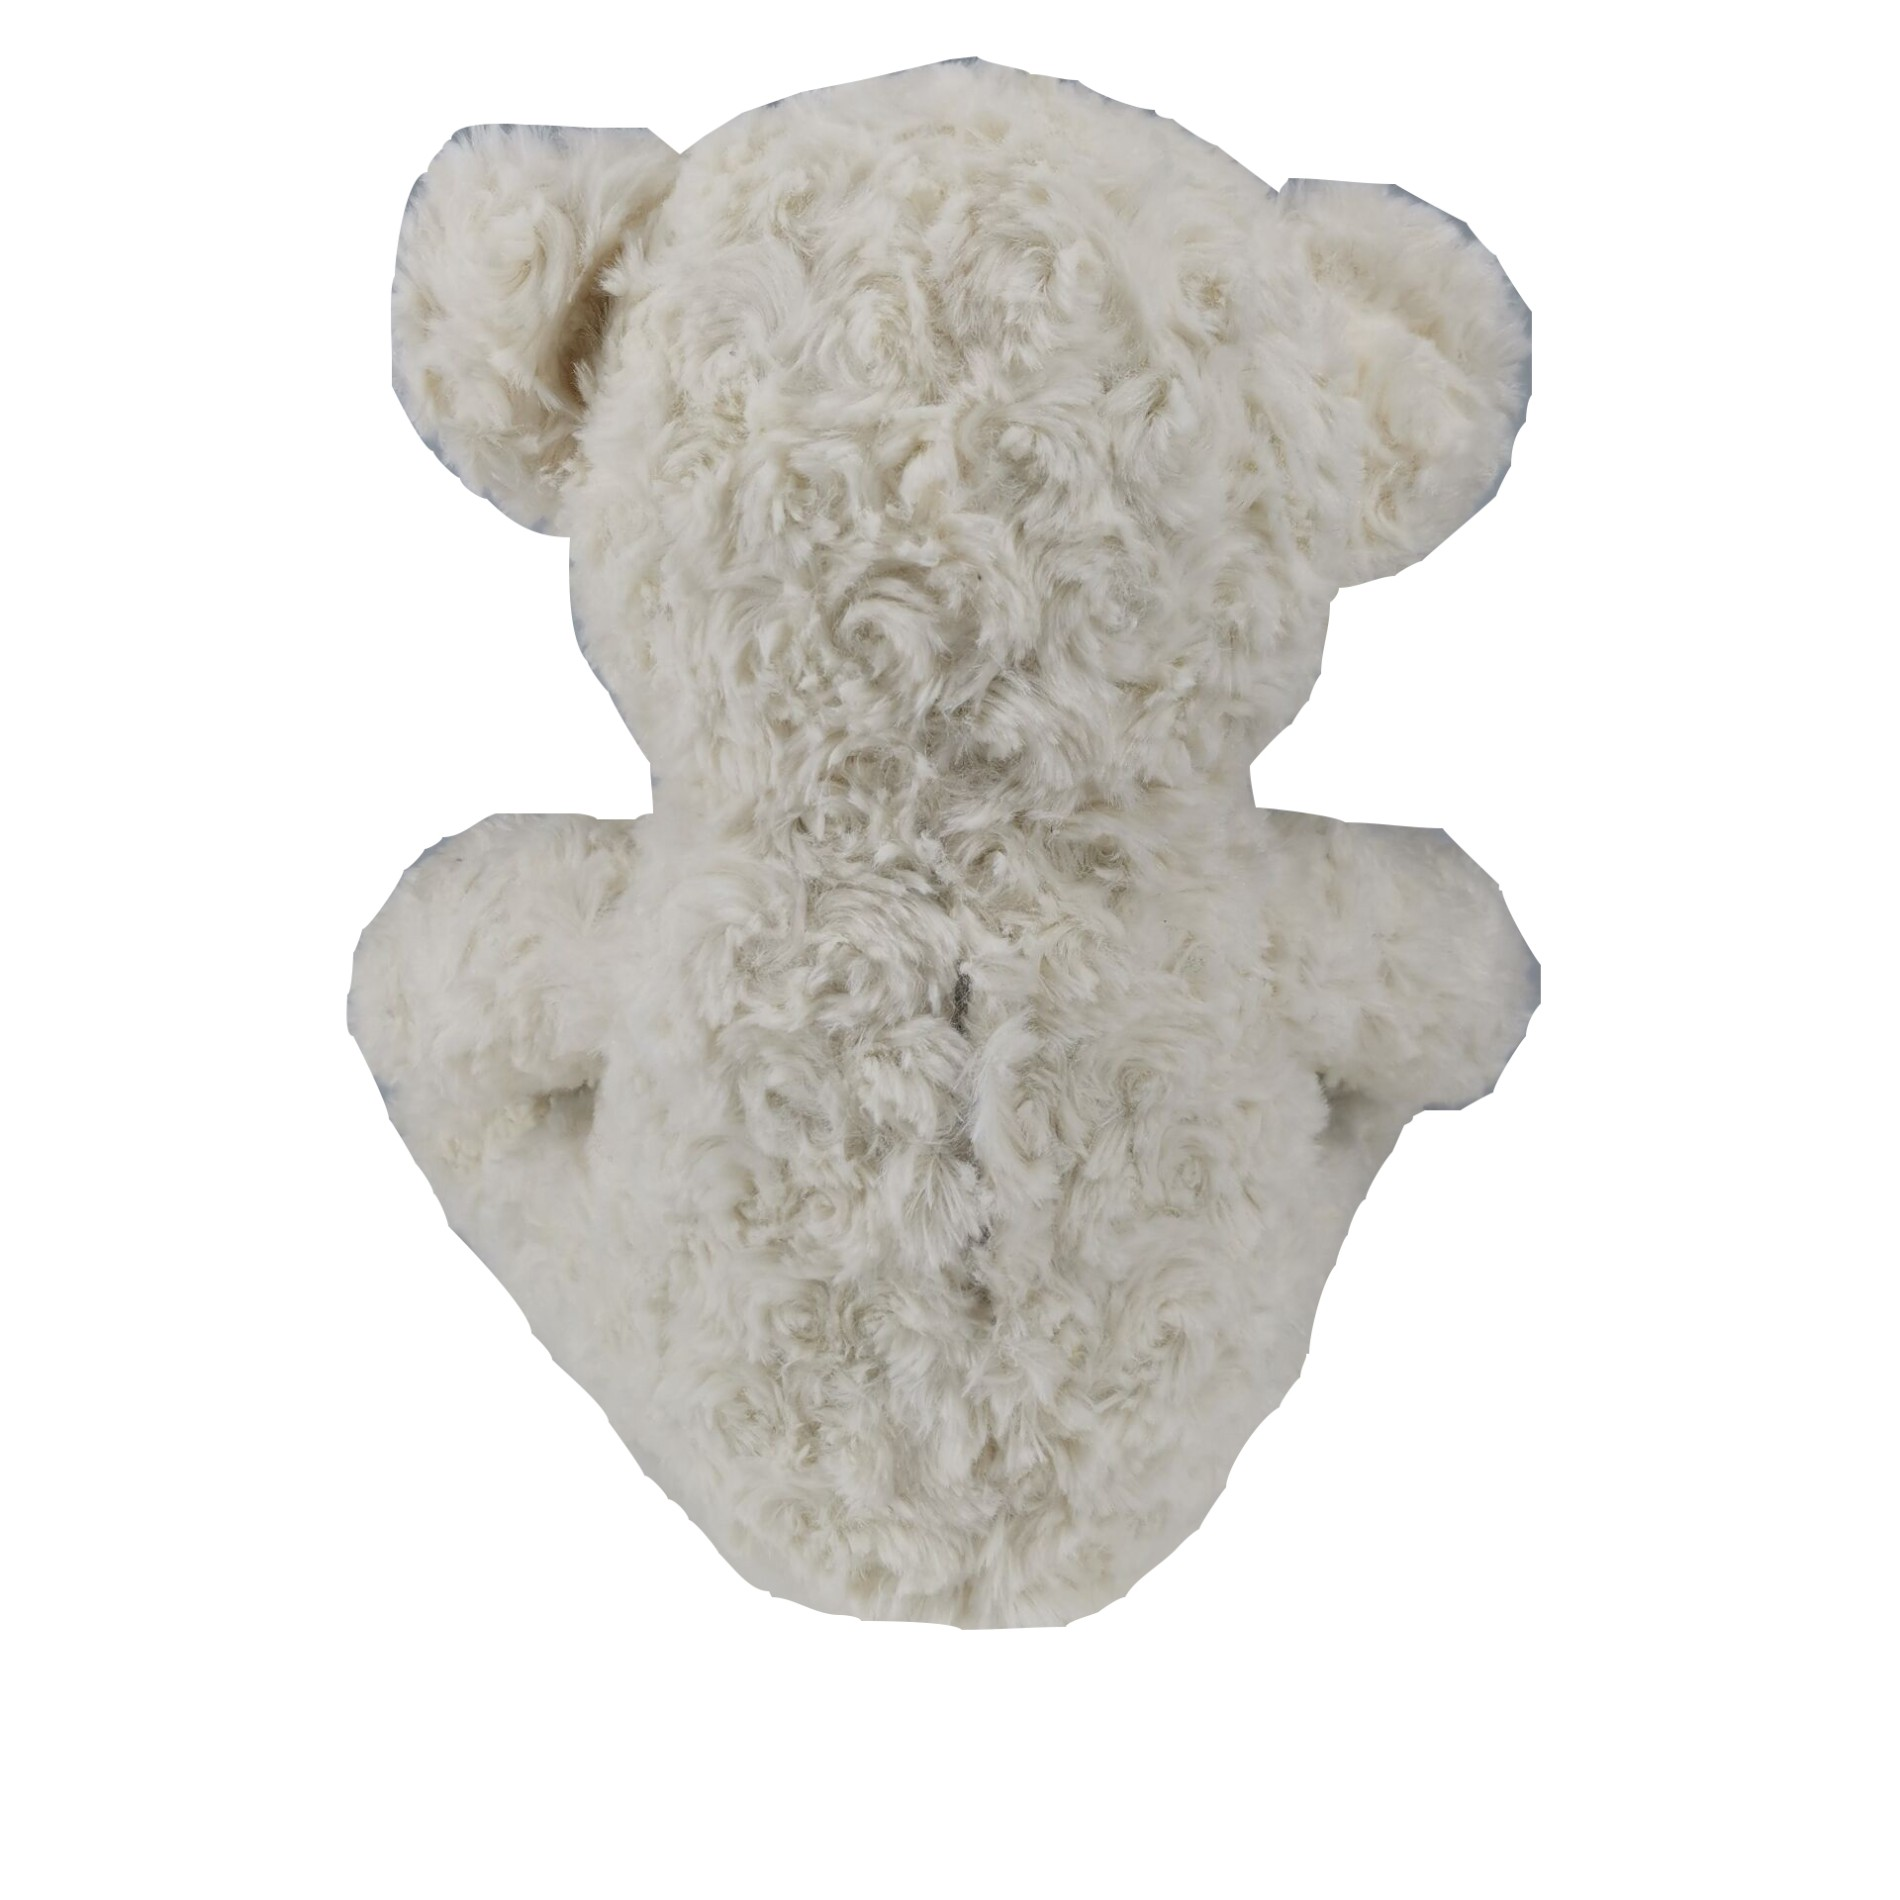 White Singing Teddy Bear with Fan